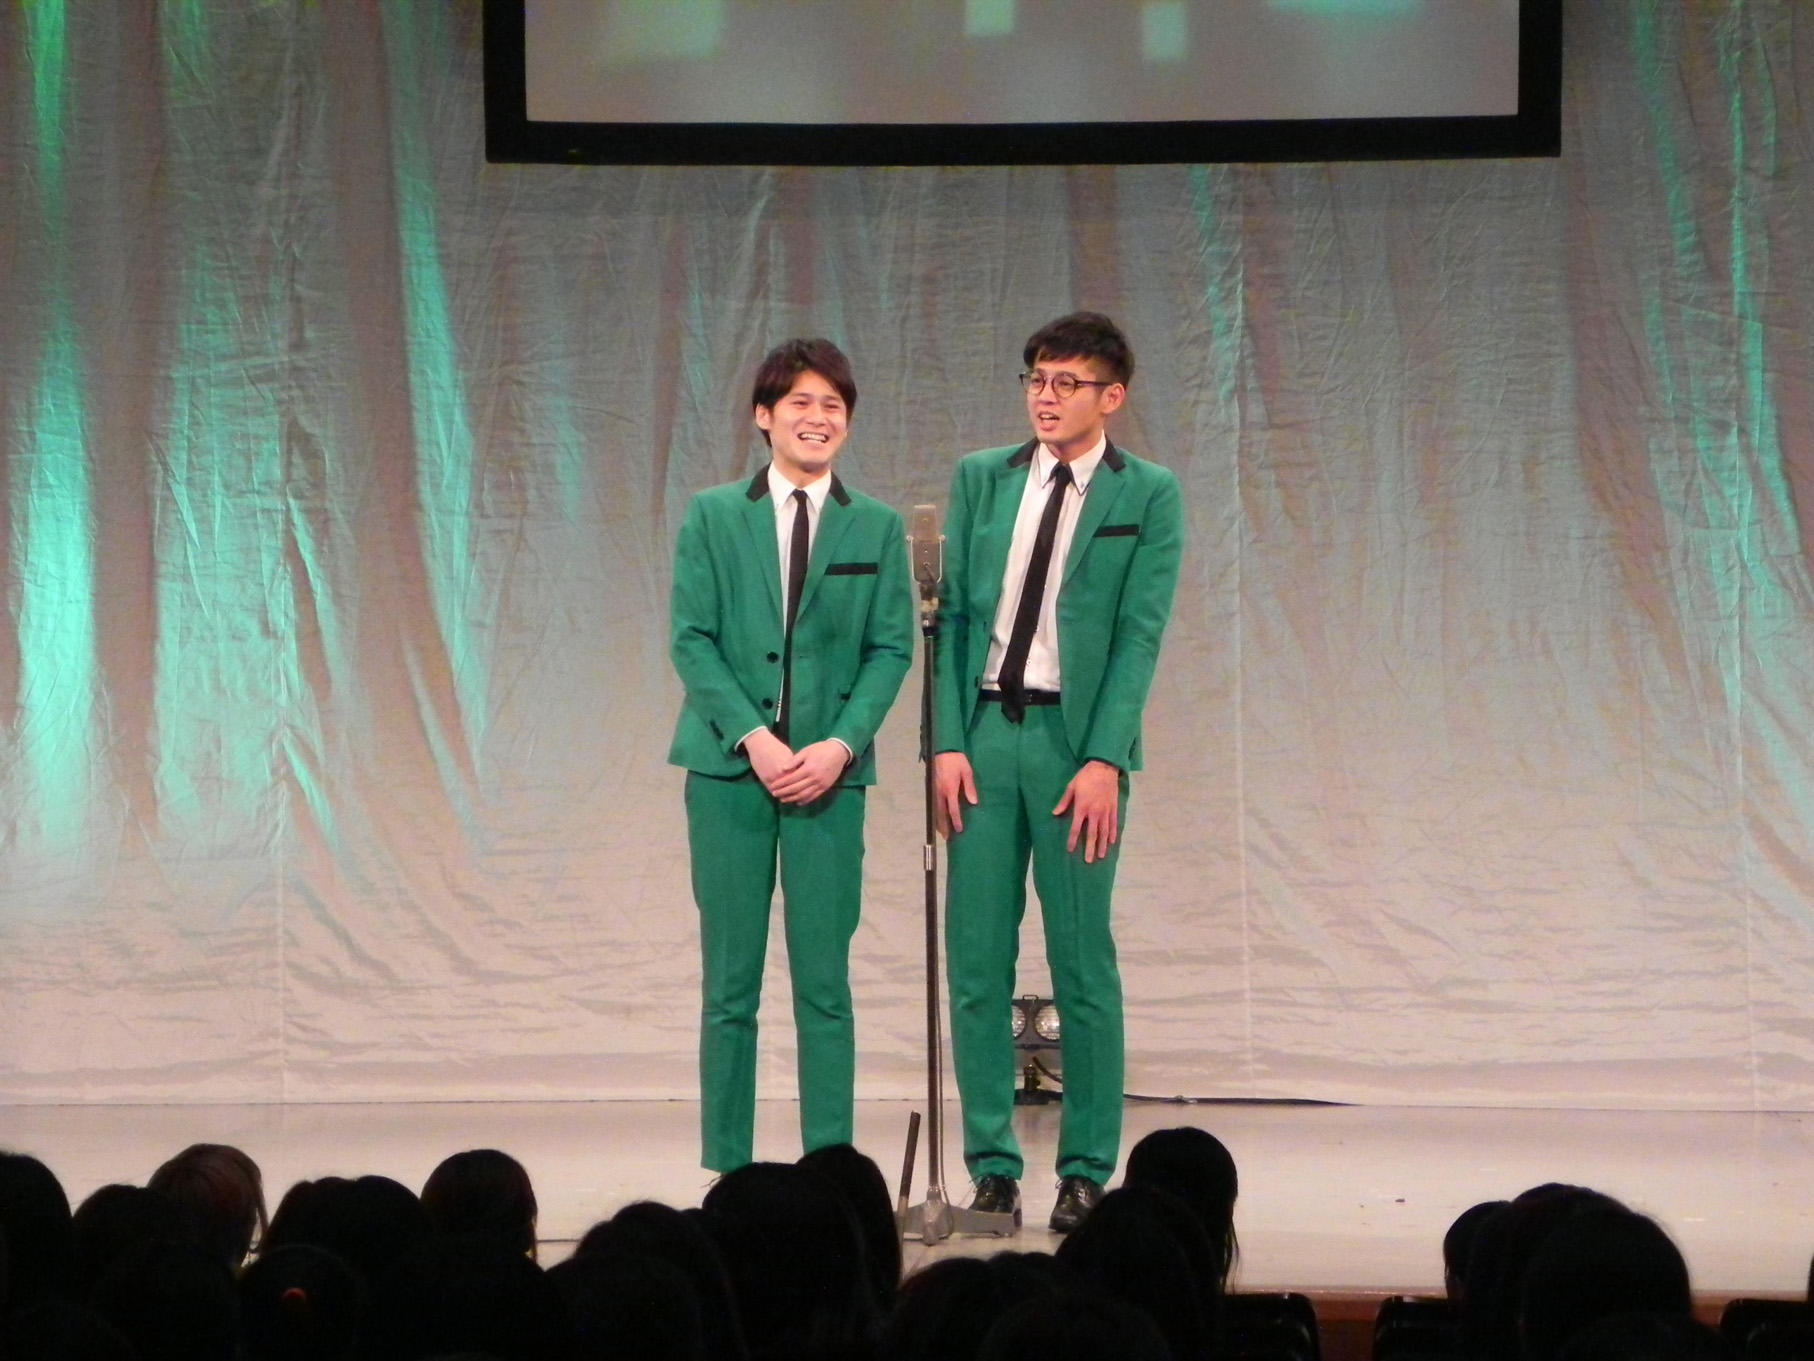 http://news.yoshimoto.co.jp/20170505191939-e3ca3c23e52eba882e9828ea94d8544246947267.jpg